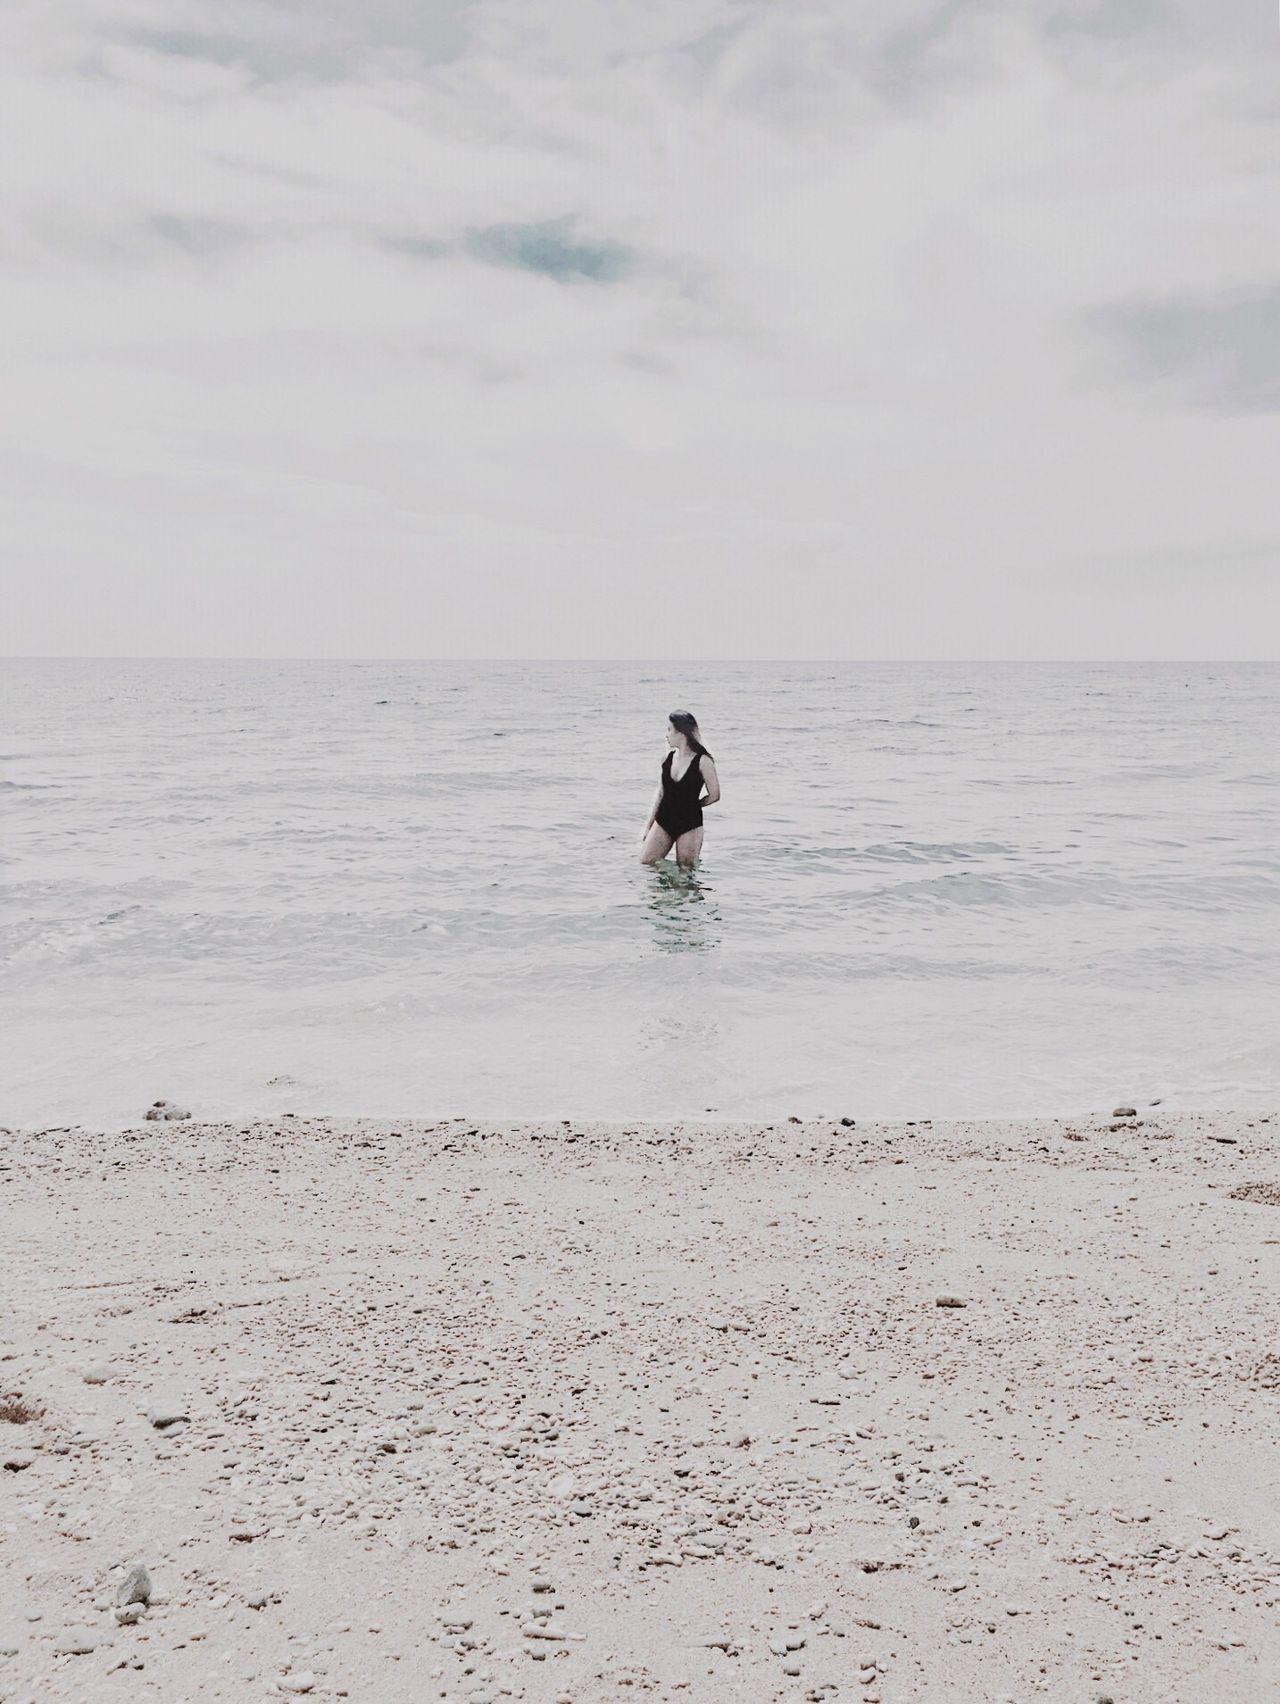 Sea Water Beach Horizon Over Water Nature Sand One Person Real People Minimal Eeyemph Eeyem Photography Eeyem EyeemPhilippines Eyeem Philippines EeYem Best Shots Minimalist Minimalism Simple Photography Tranquil Scene Tranquility Minimalobsession White Background